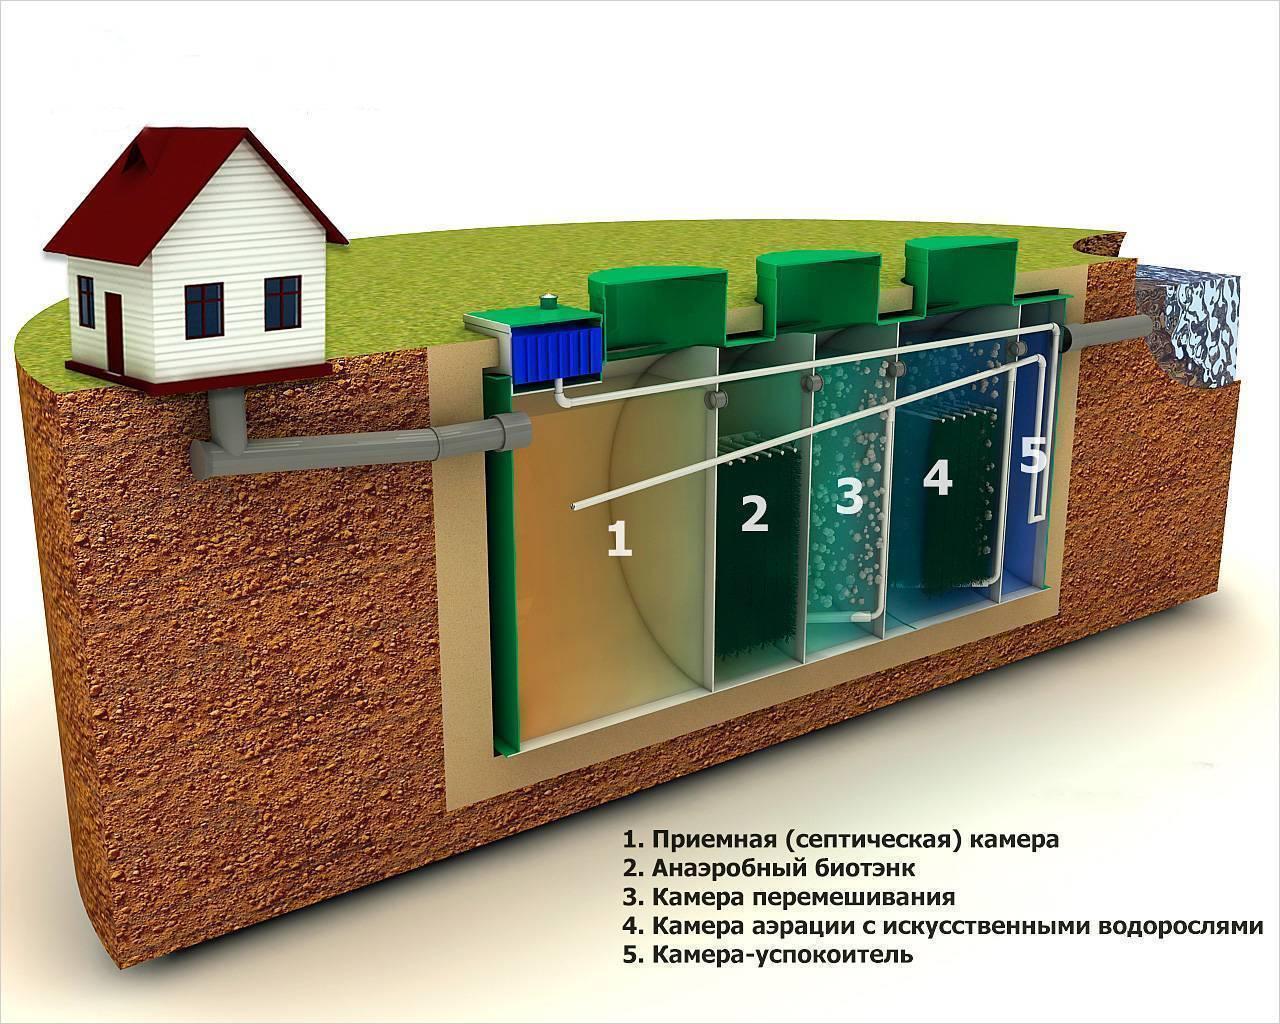 Канализация в каркасном доме своими руками: монтаж труб, септики и т.д.